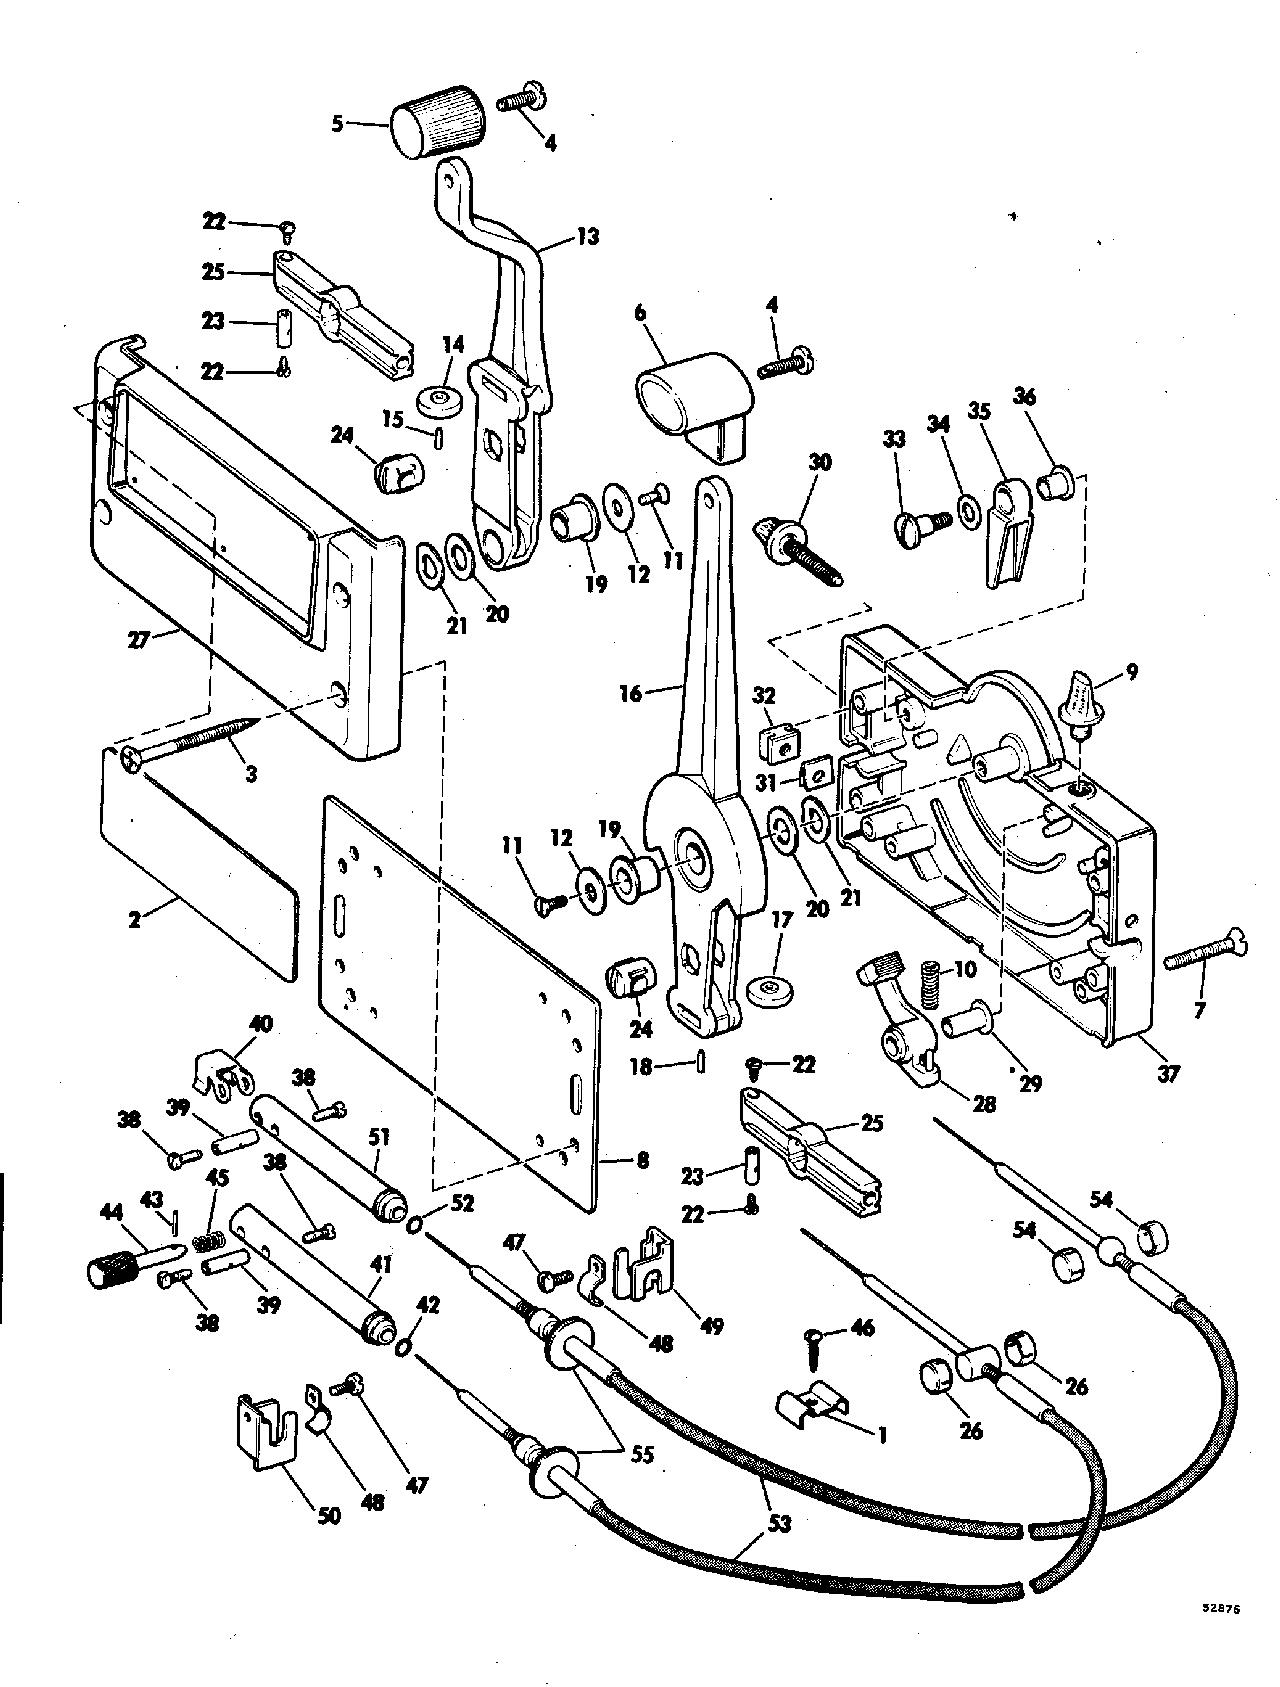 1977 mercury outboard control diagram